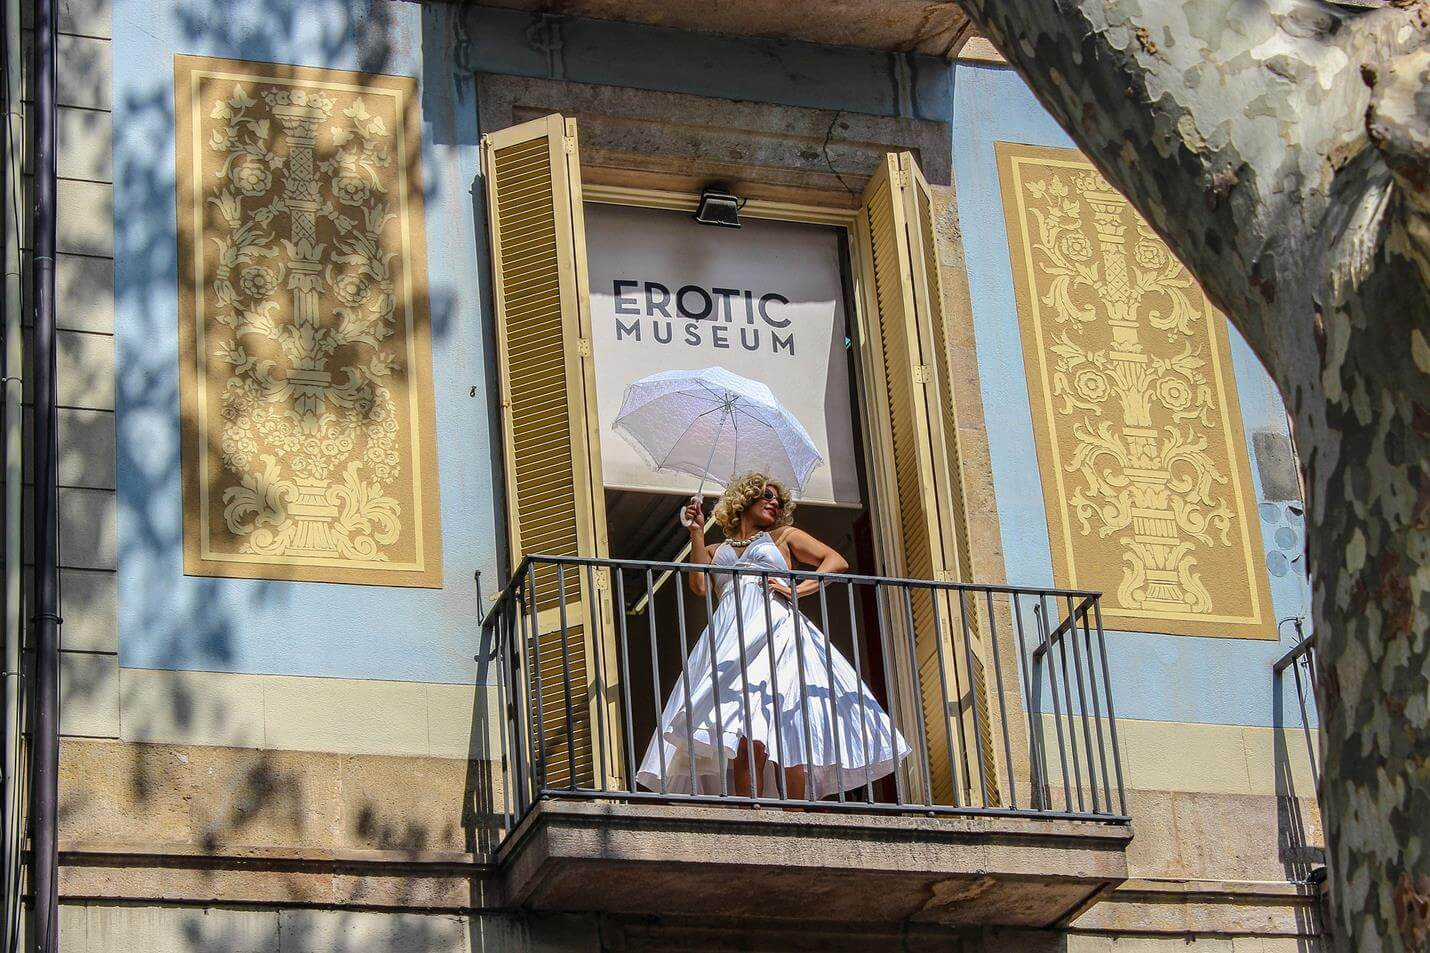 Erotik Museum in Barcelona - Top